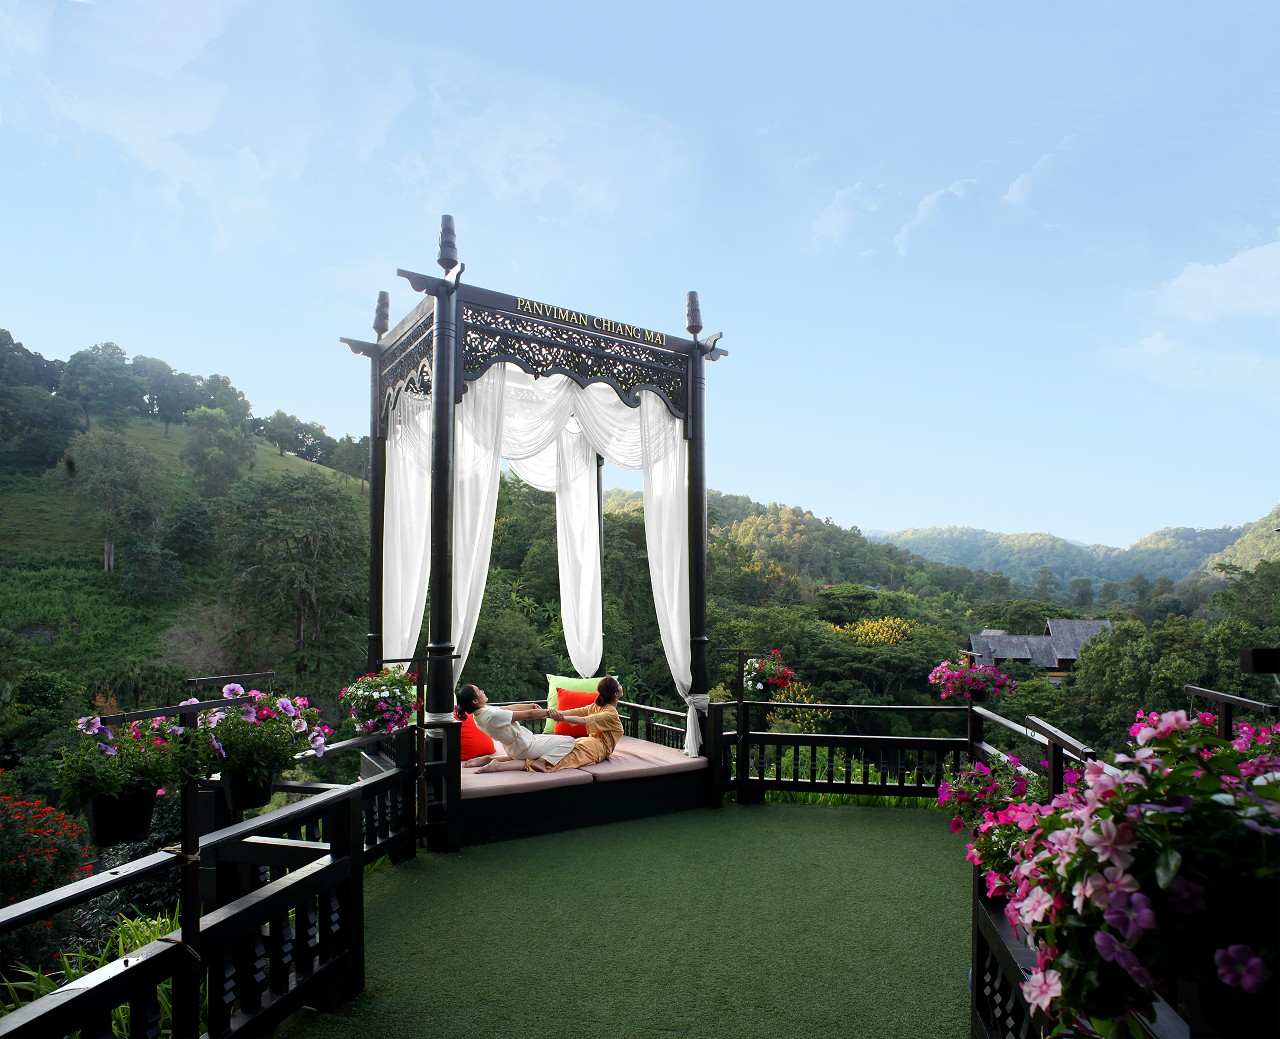 Panviman Chiang Mai Spa Resort: A Paradise Moment